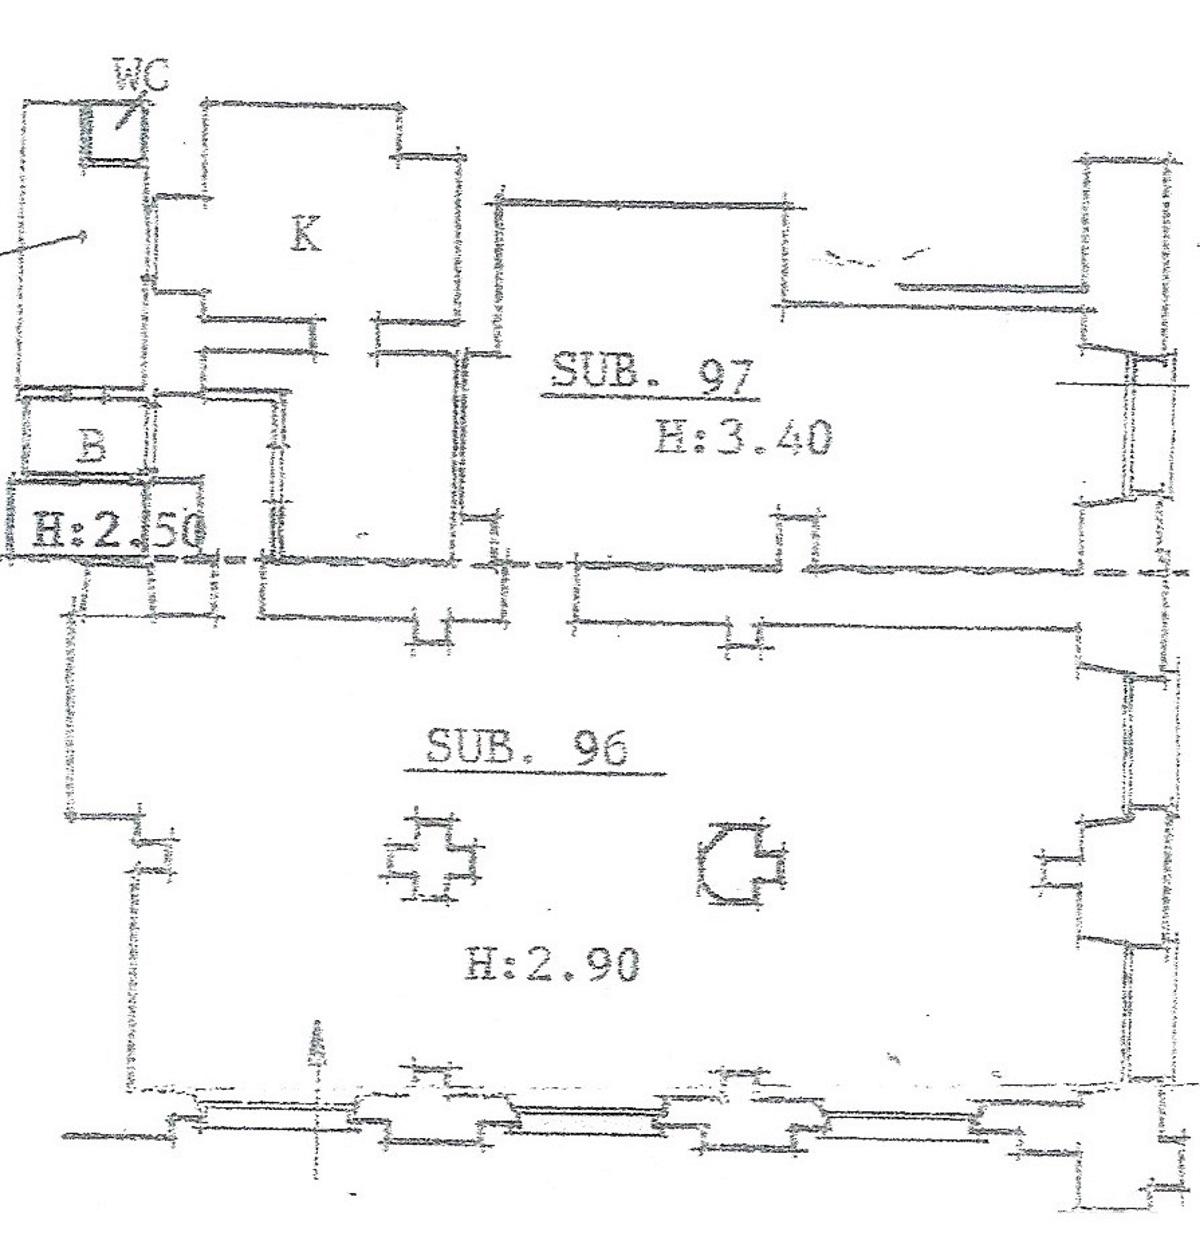 Savona centralissimo RIF. 357 MURI NEGOZIO